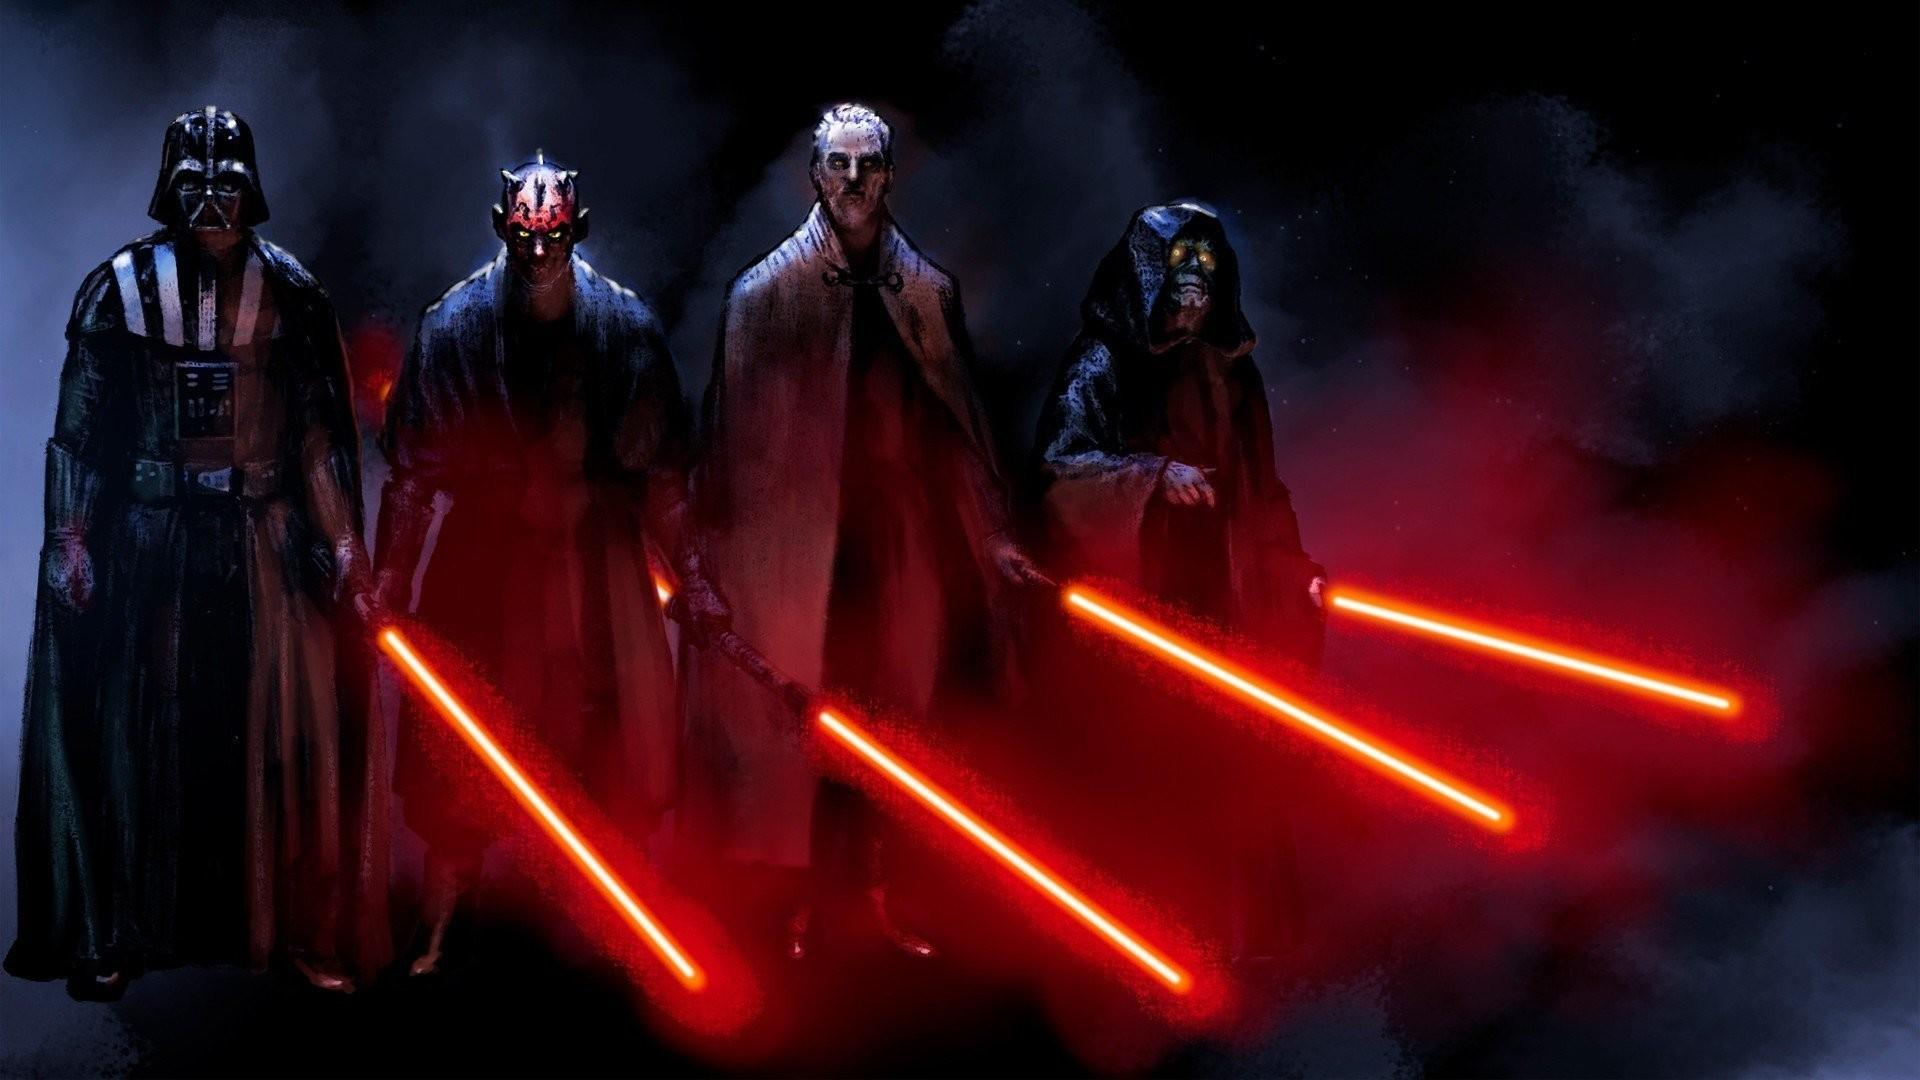 Star wars stormtroopers darth maul lightsabers darth vader natalie .